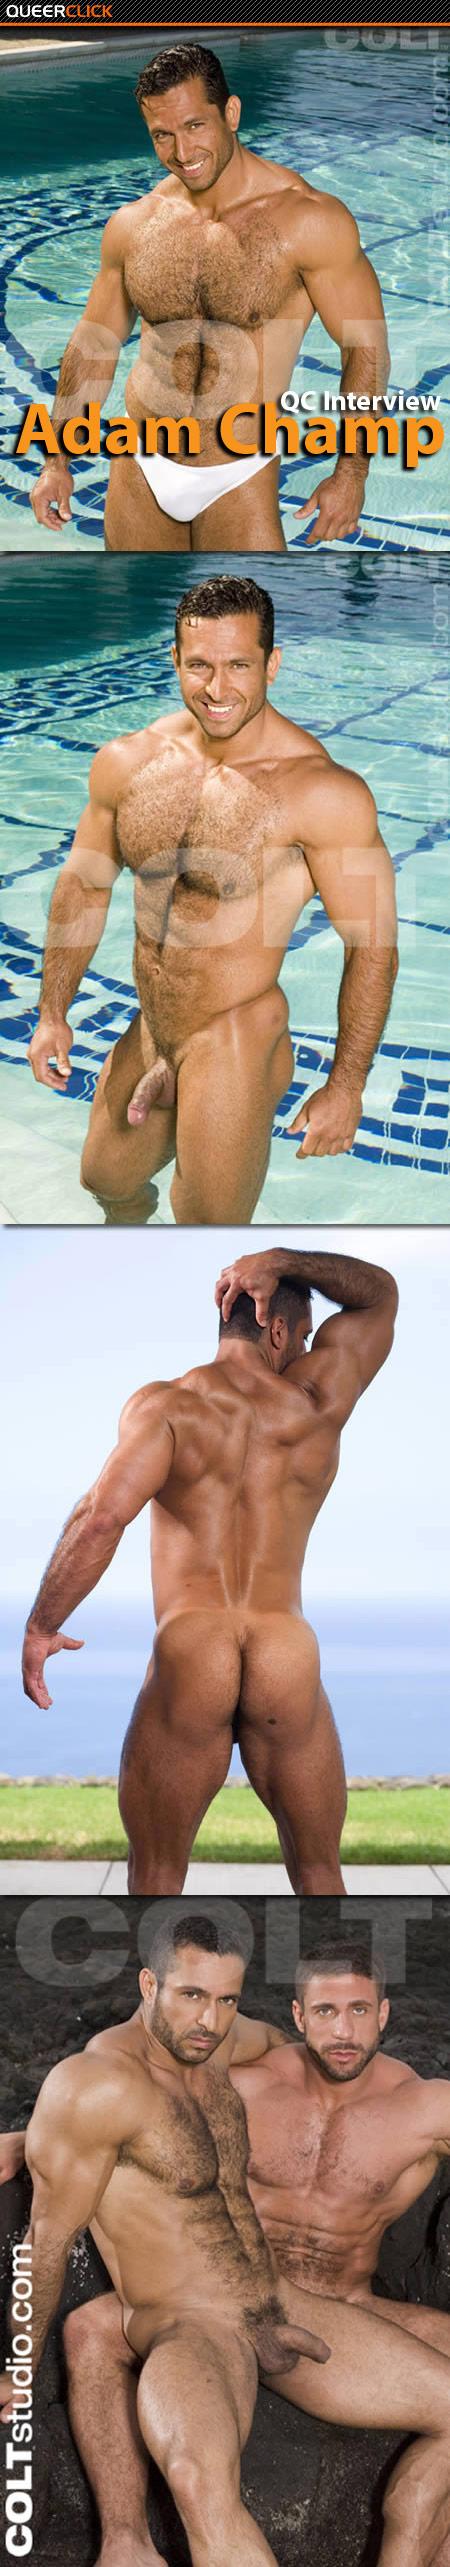 queery adamchamp 01 Hot Gay Porn Stars Calvin & Jonathan From